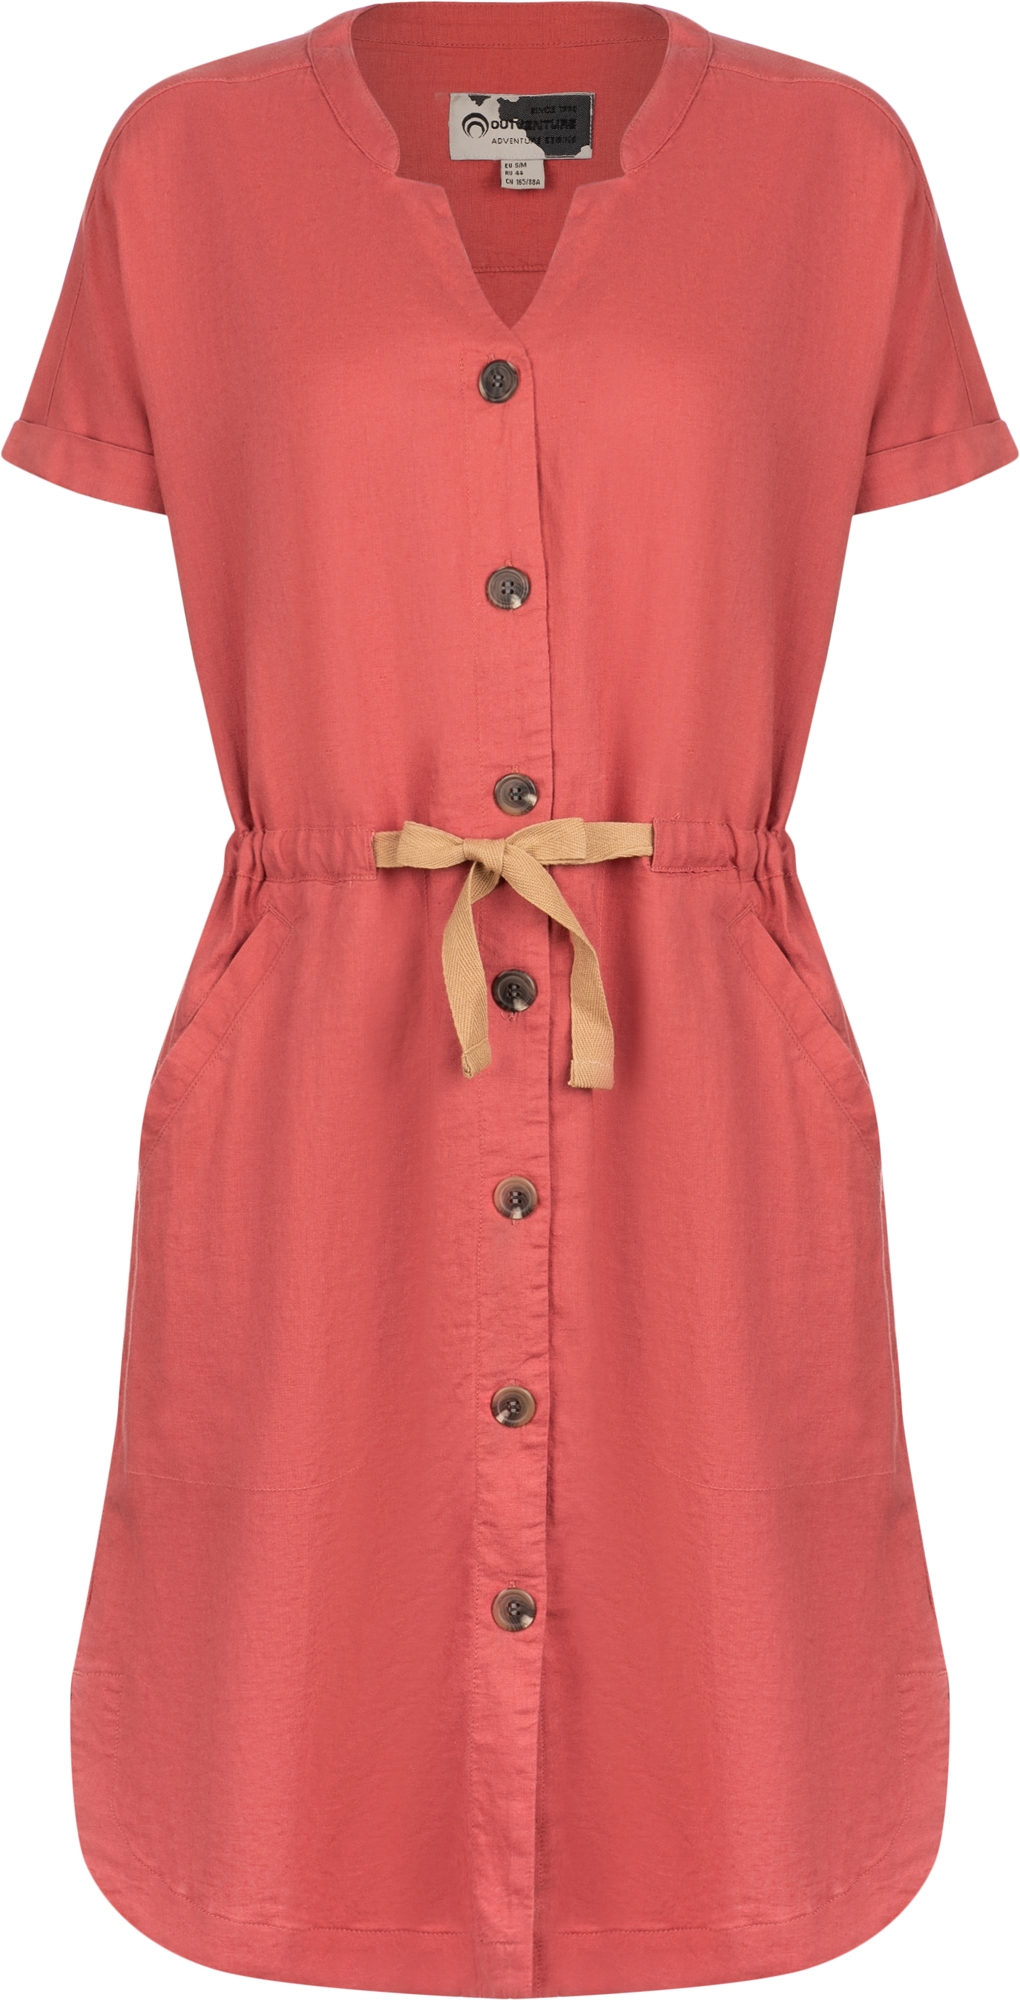 Outventure Платье женское Outventure, размер 46 платье женское ягода